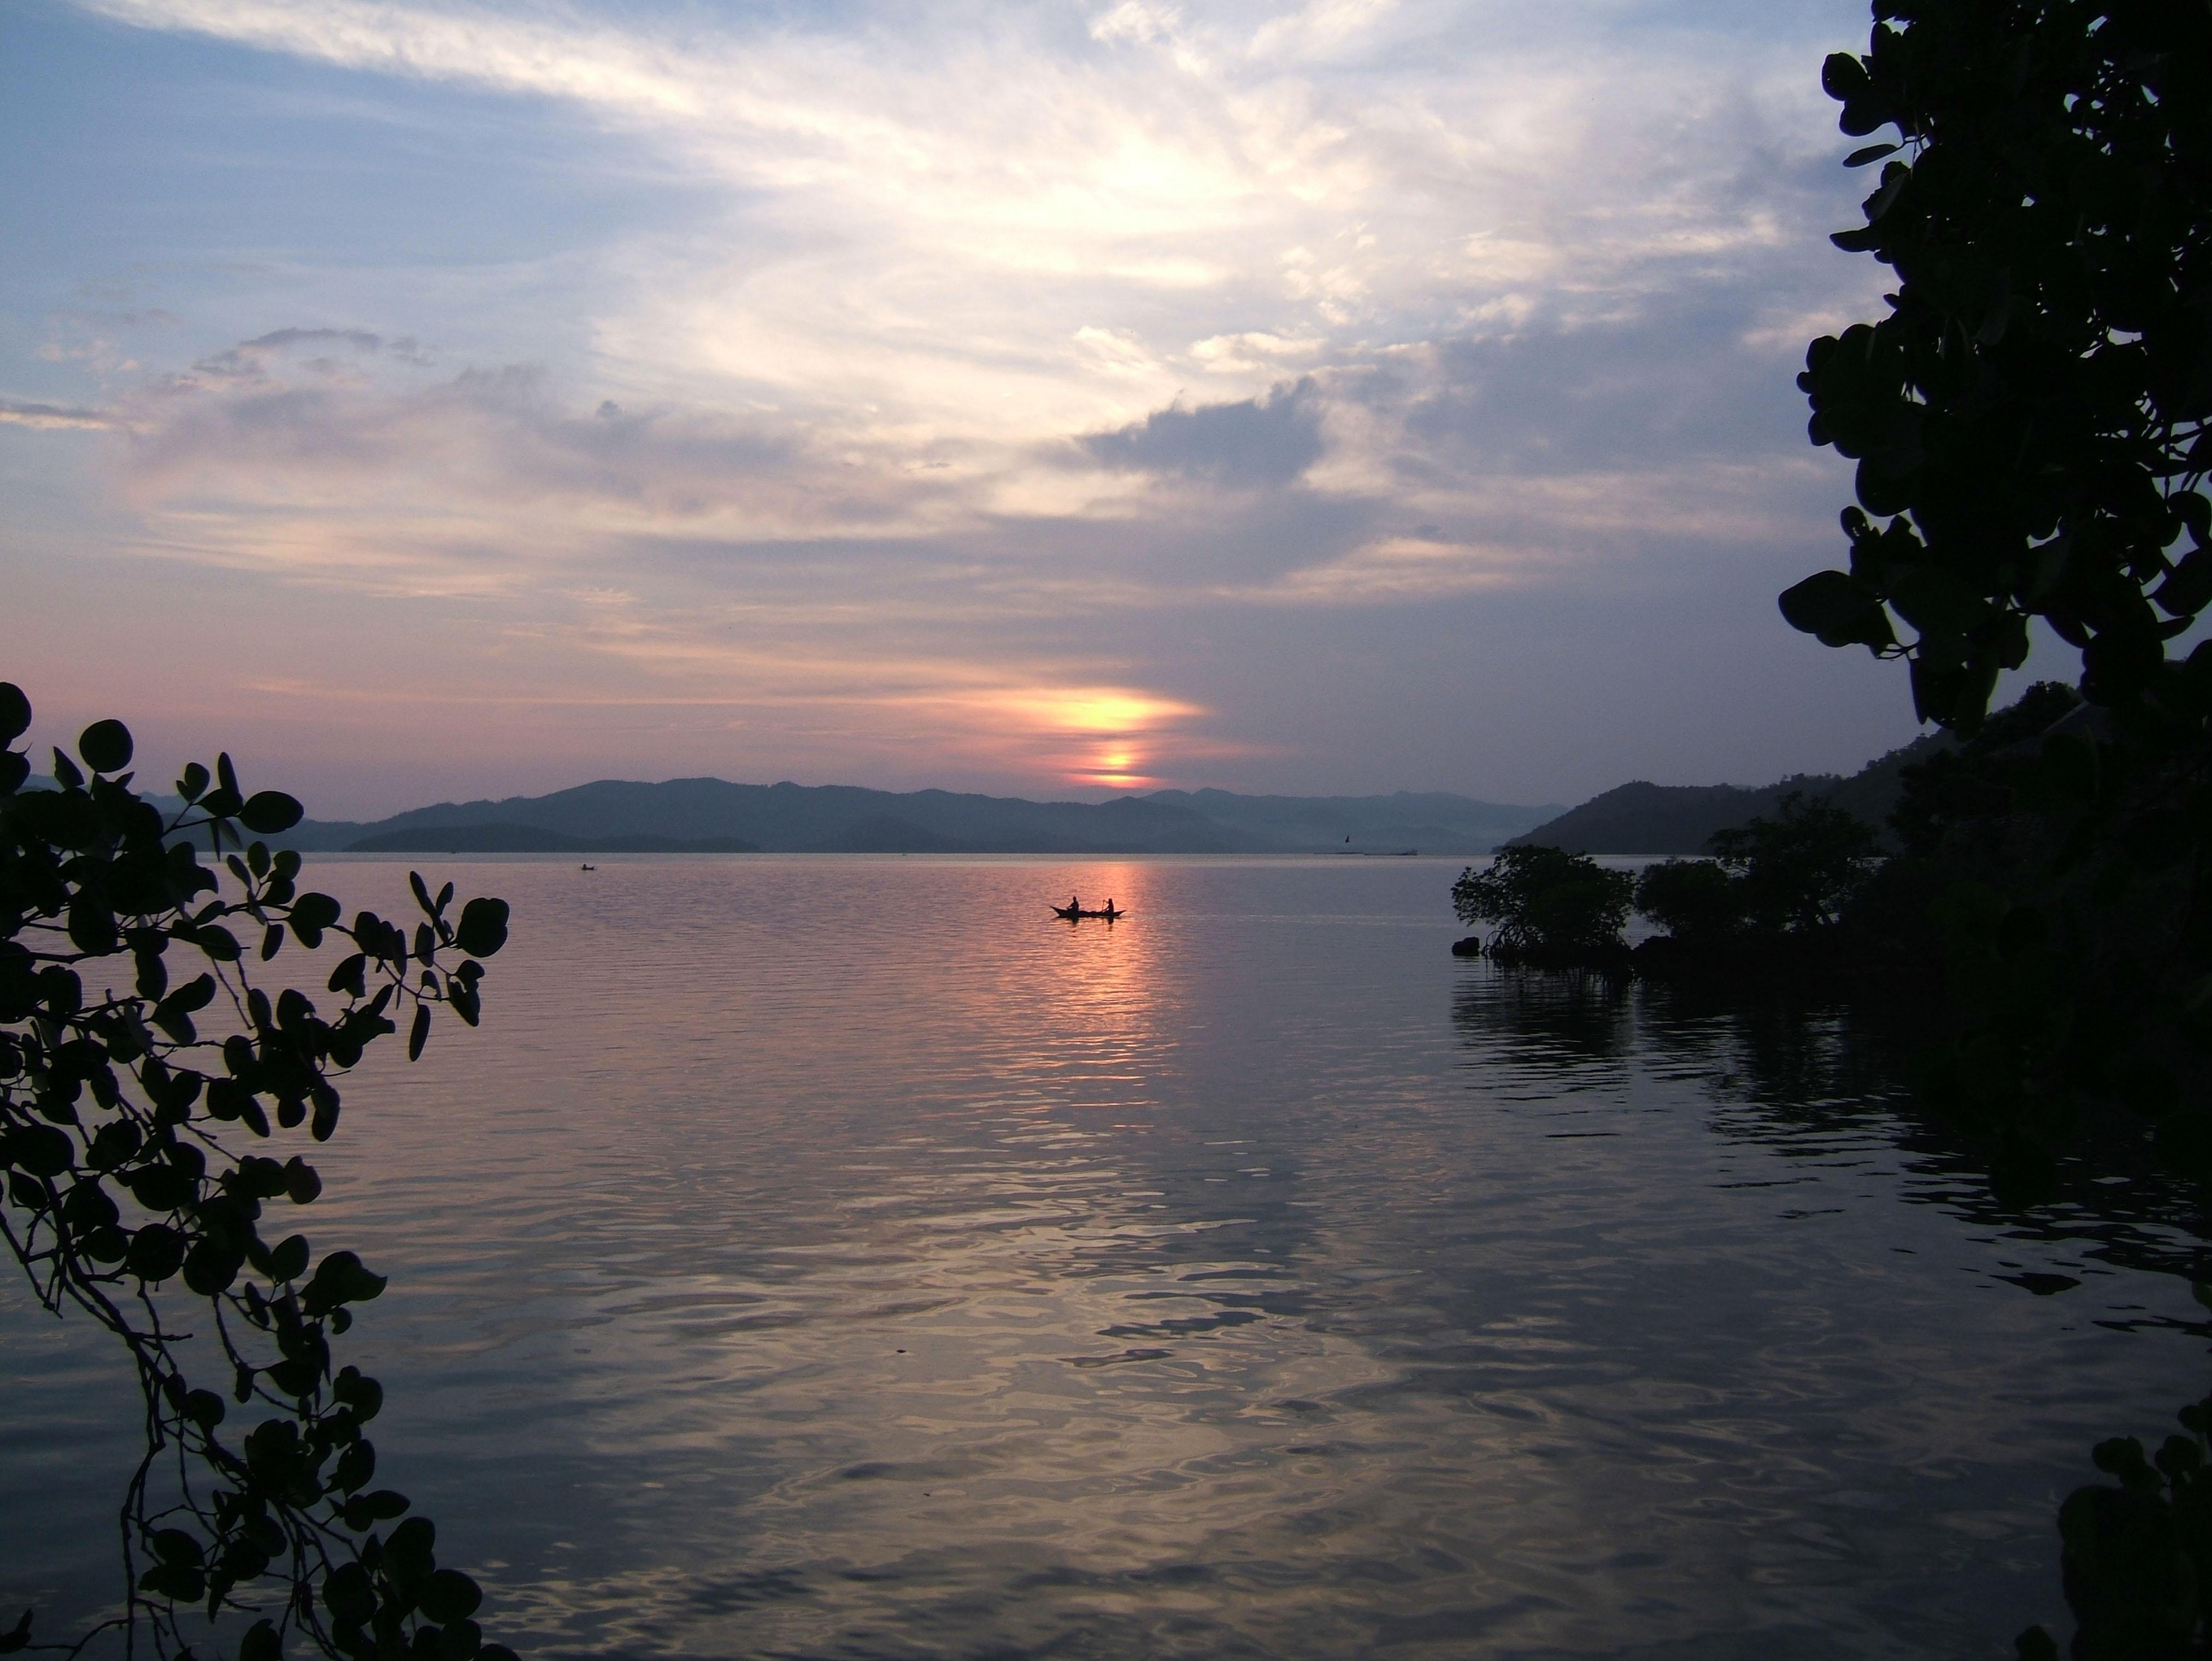 Philippines Palawan Islands CoronJuly 2005 07